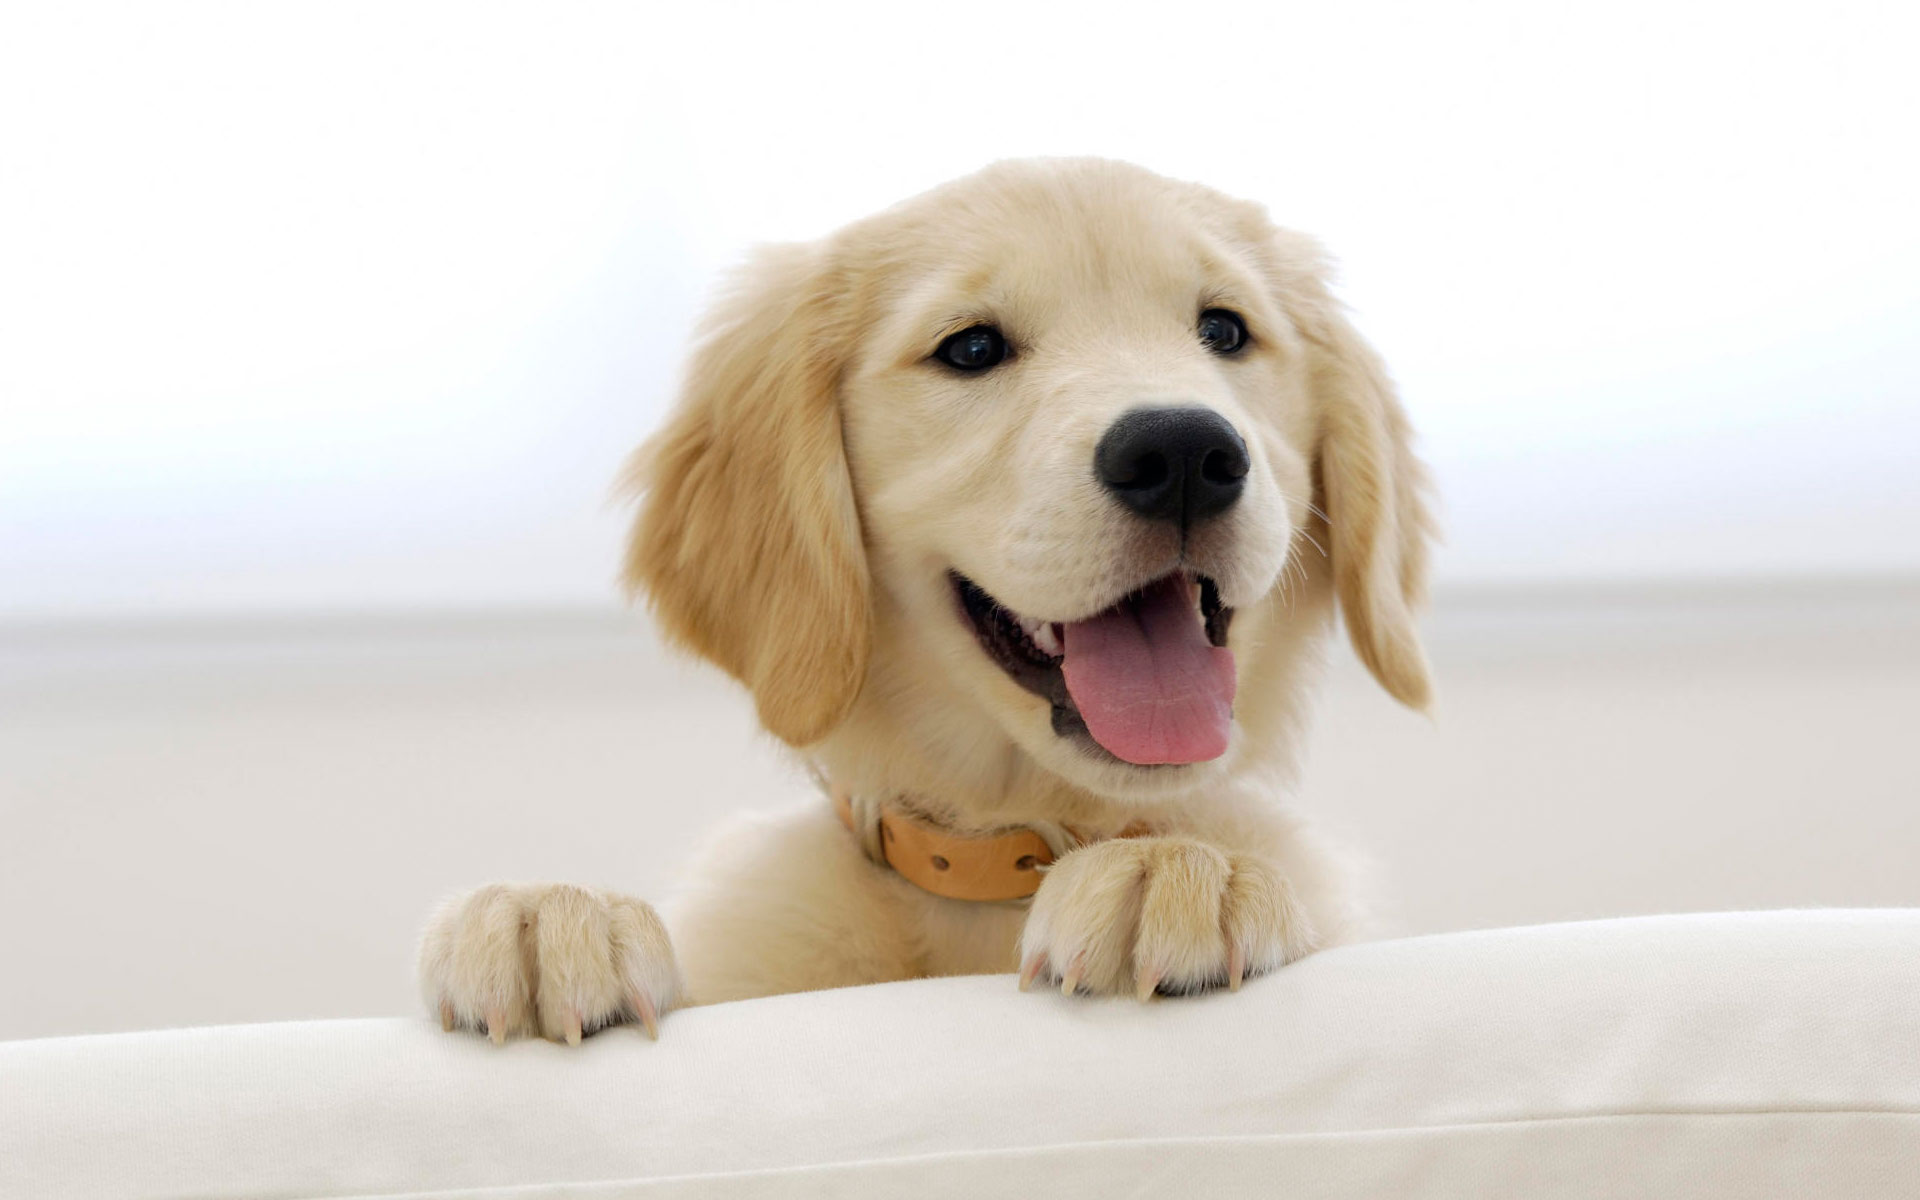 adoptar un perro - Lo que debes saber antes de adoptar un cachorro